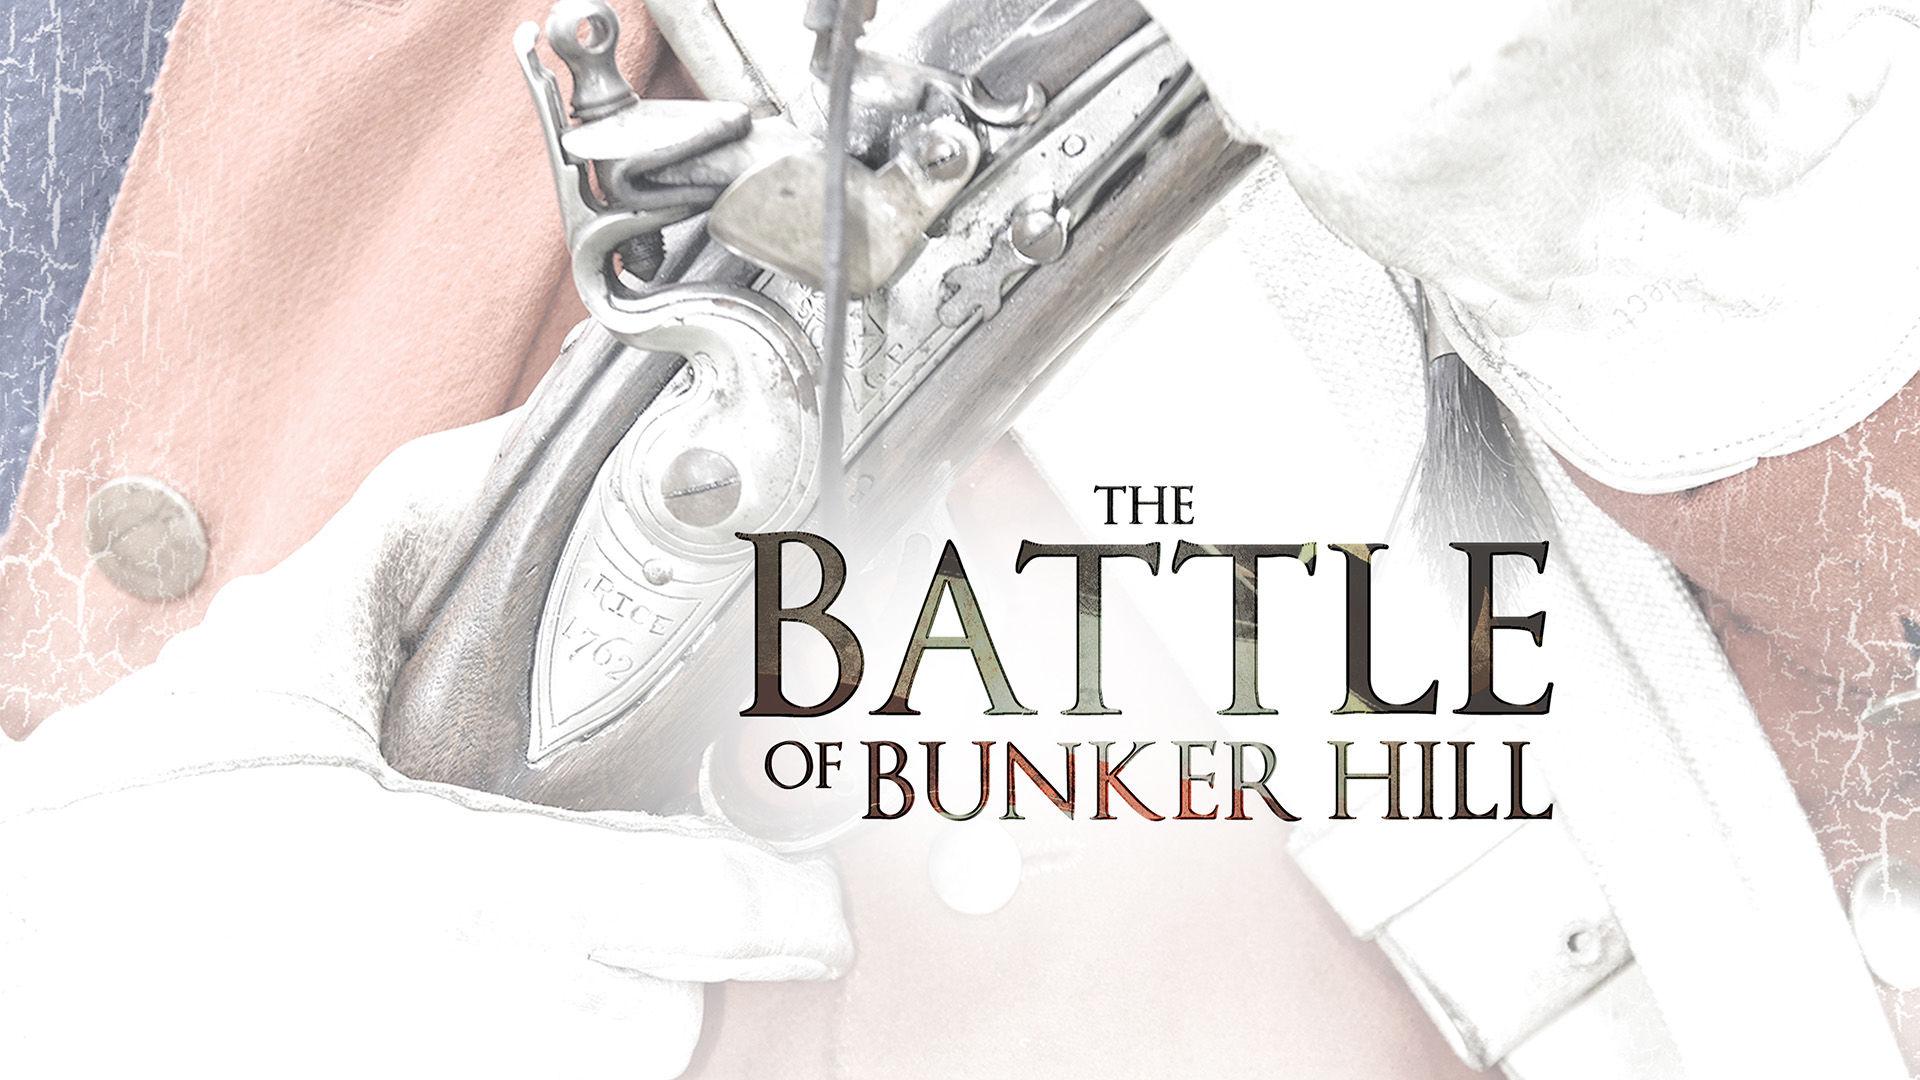 Battle Of Bunker Hill, The